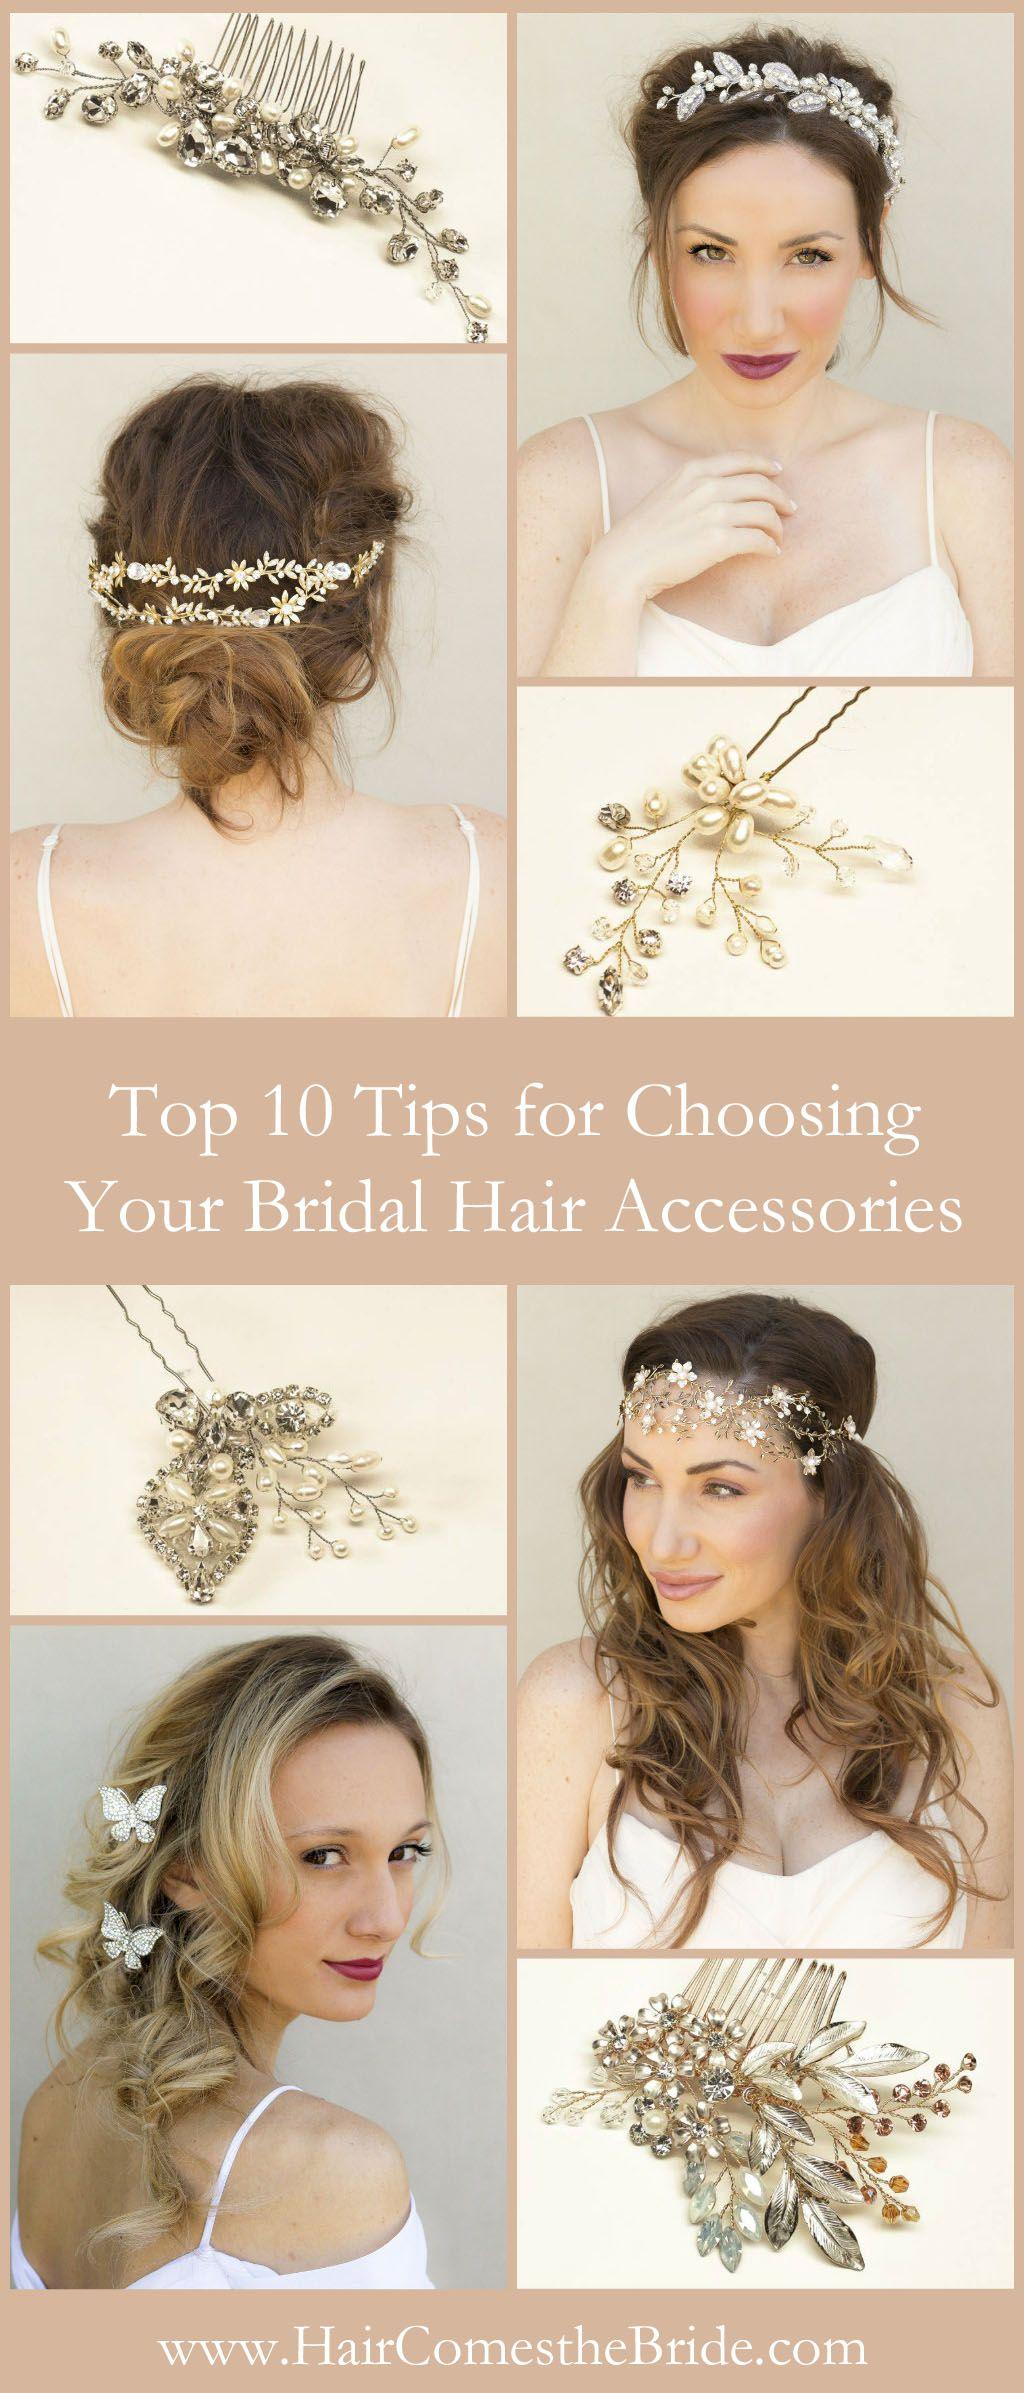 Top 10 Tips for Choosing Your Bridal Hair Accessories | Bridal hair ...